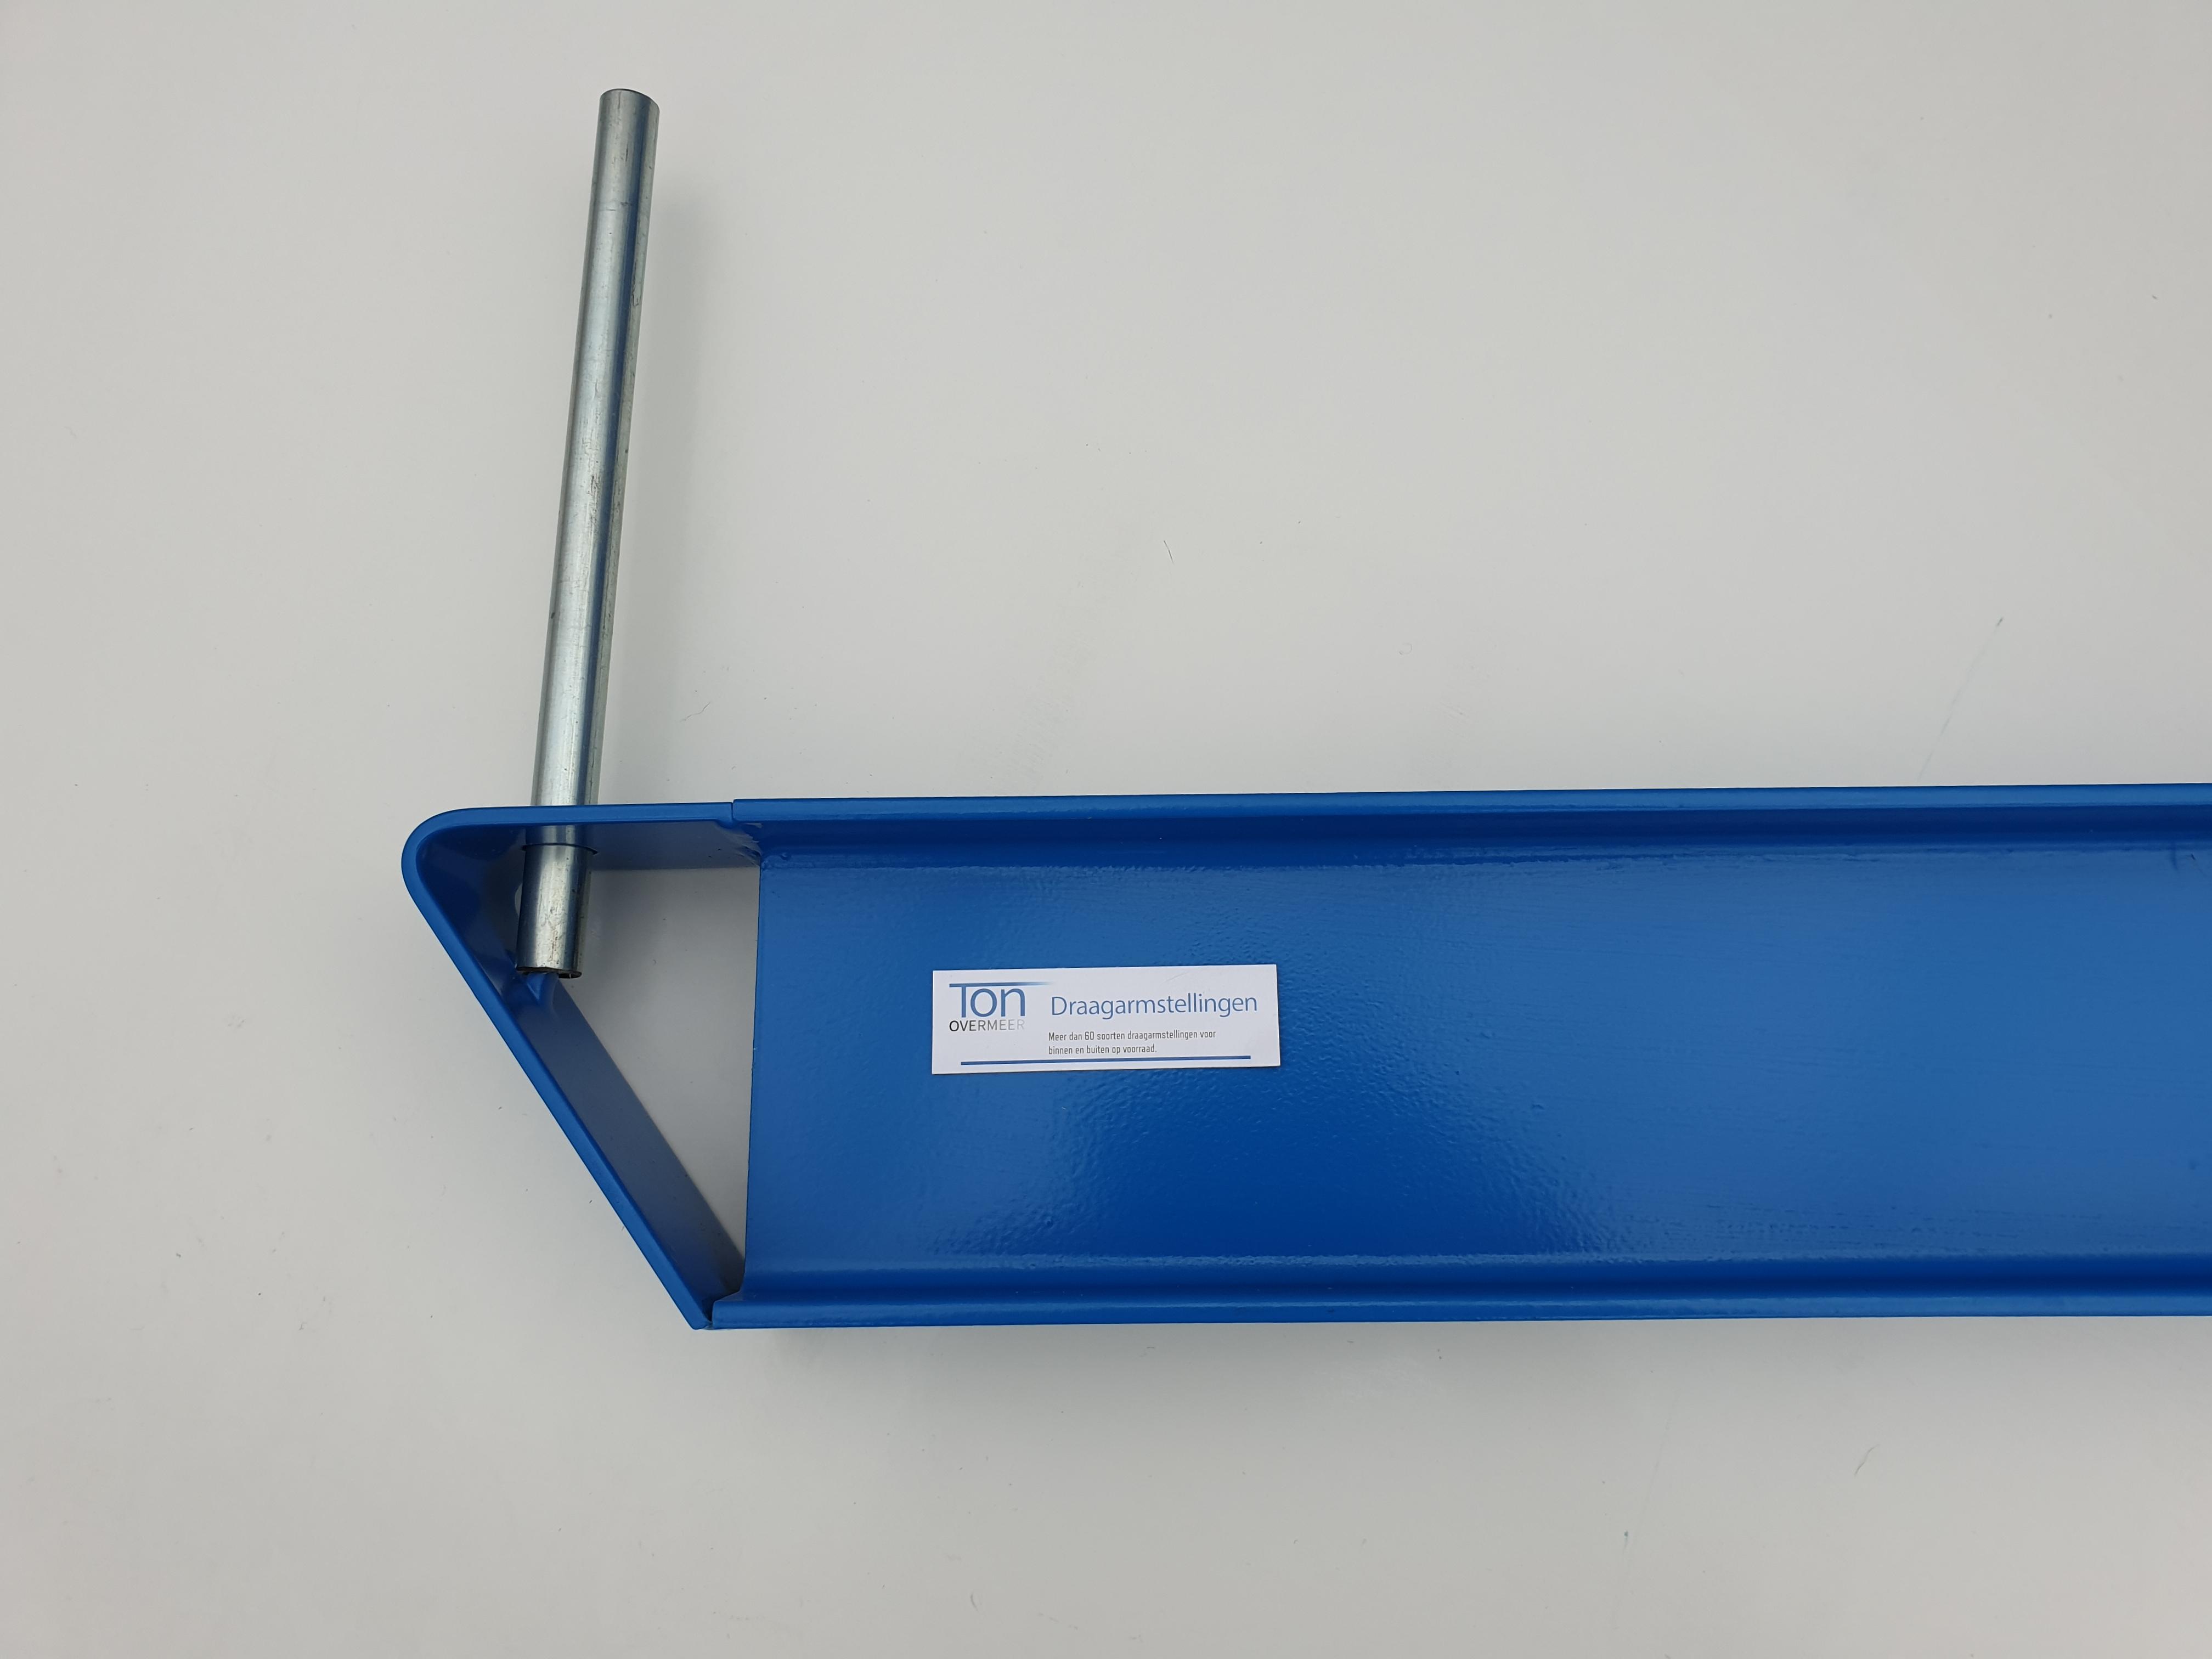 Afrolzekering 200 mm hoog (V780)